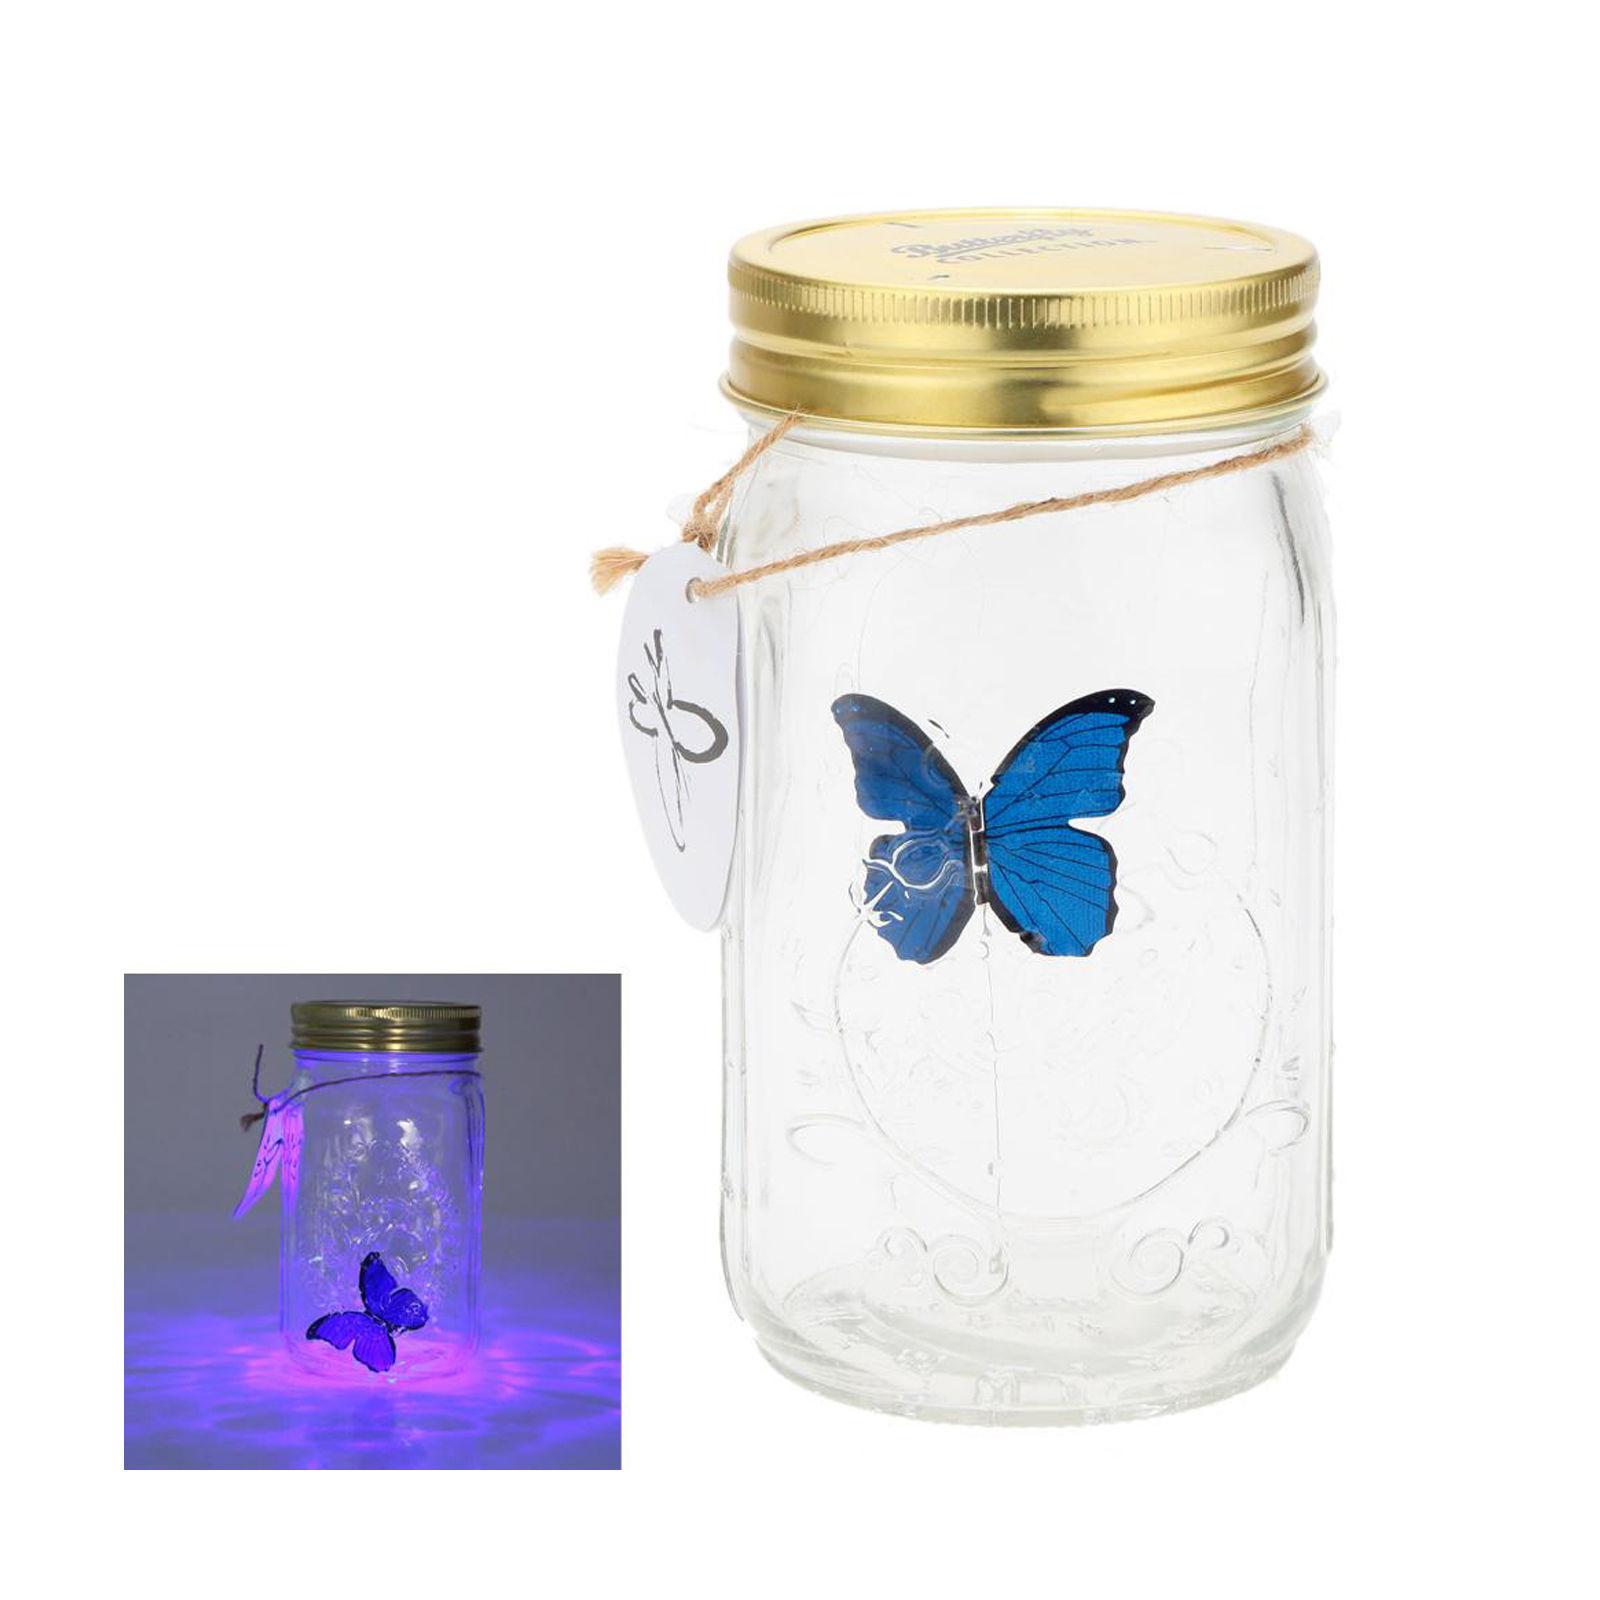 LED Flying Butterfly Bottle Glass Jar Night Light Romantic Gifts